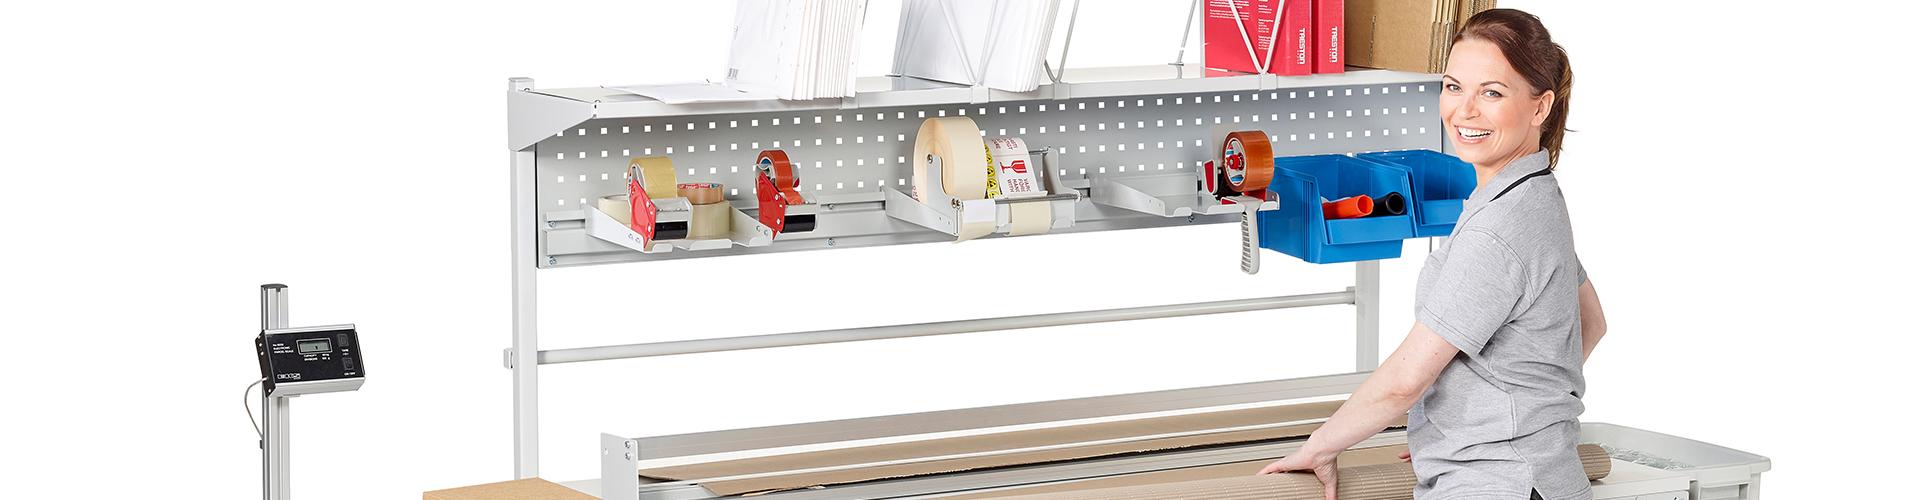 Sovella Nederland levert modulaire inpaktafels van het merk Treston